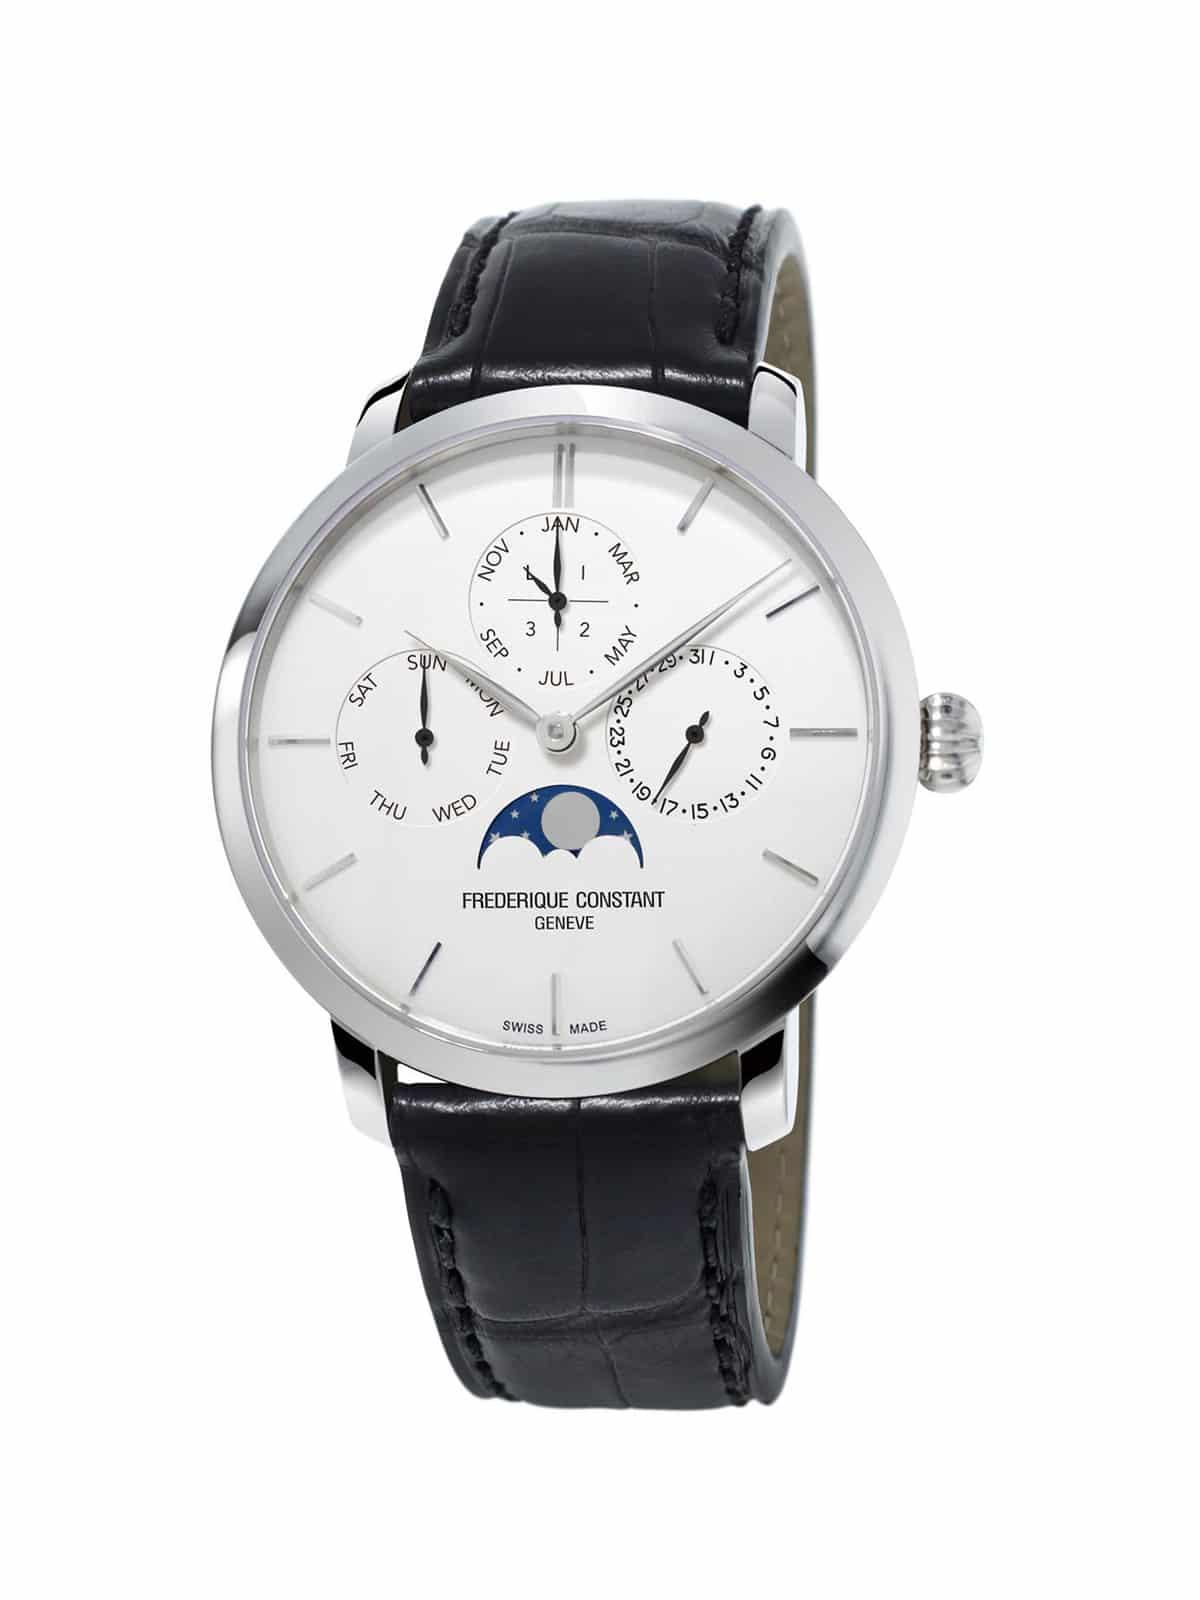 Frederique Constant Slimline Perpetual Calendar White Dial